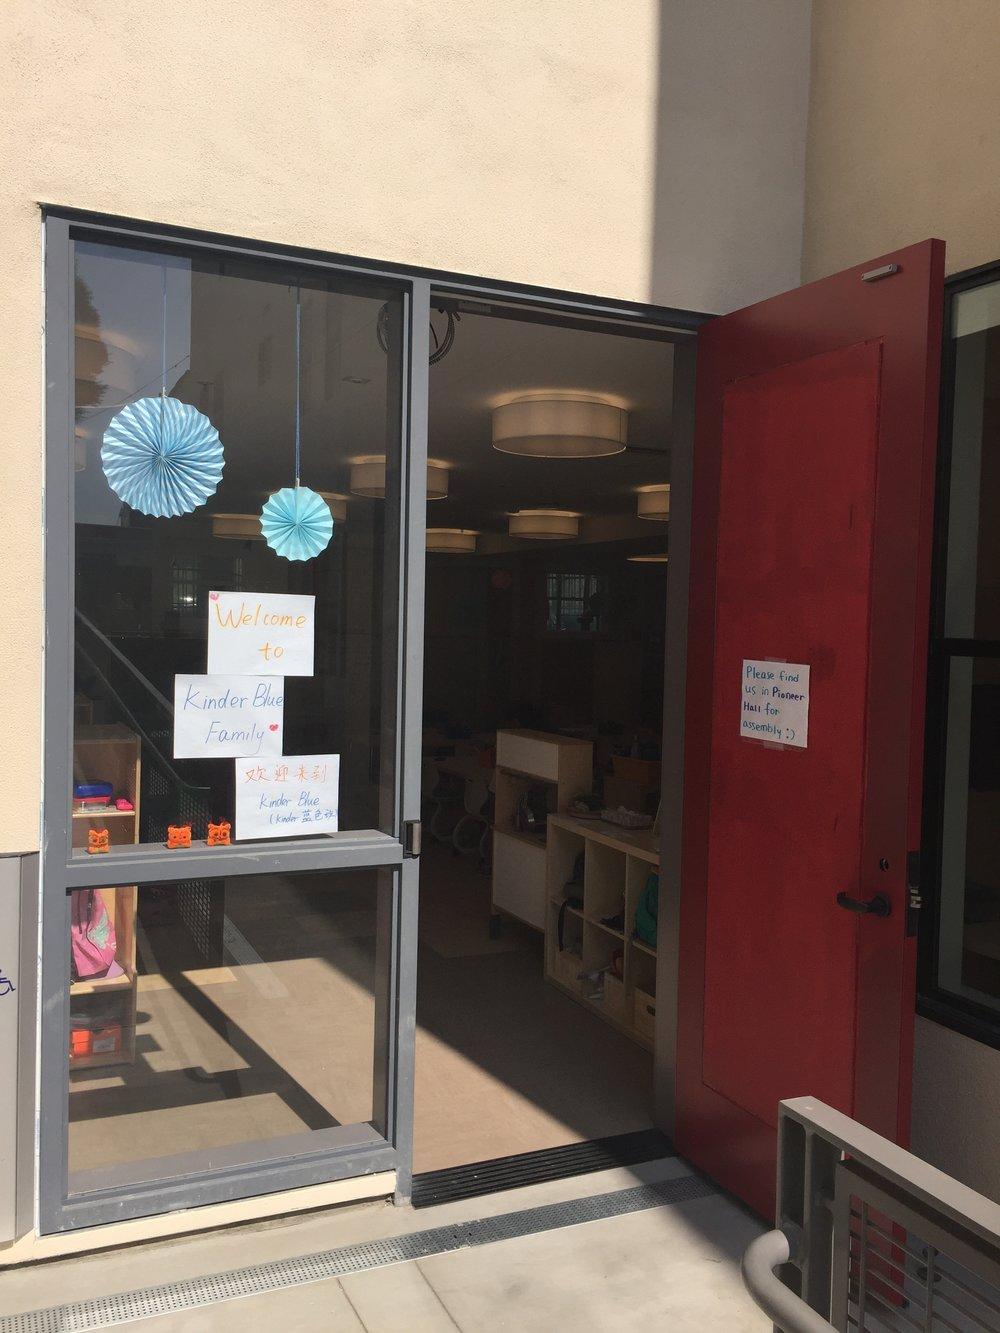 The brand-new Kindergarten Blue classroom.